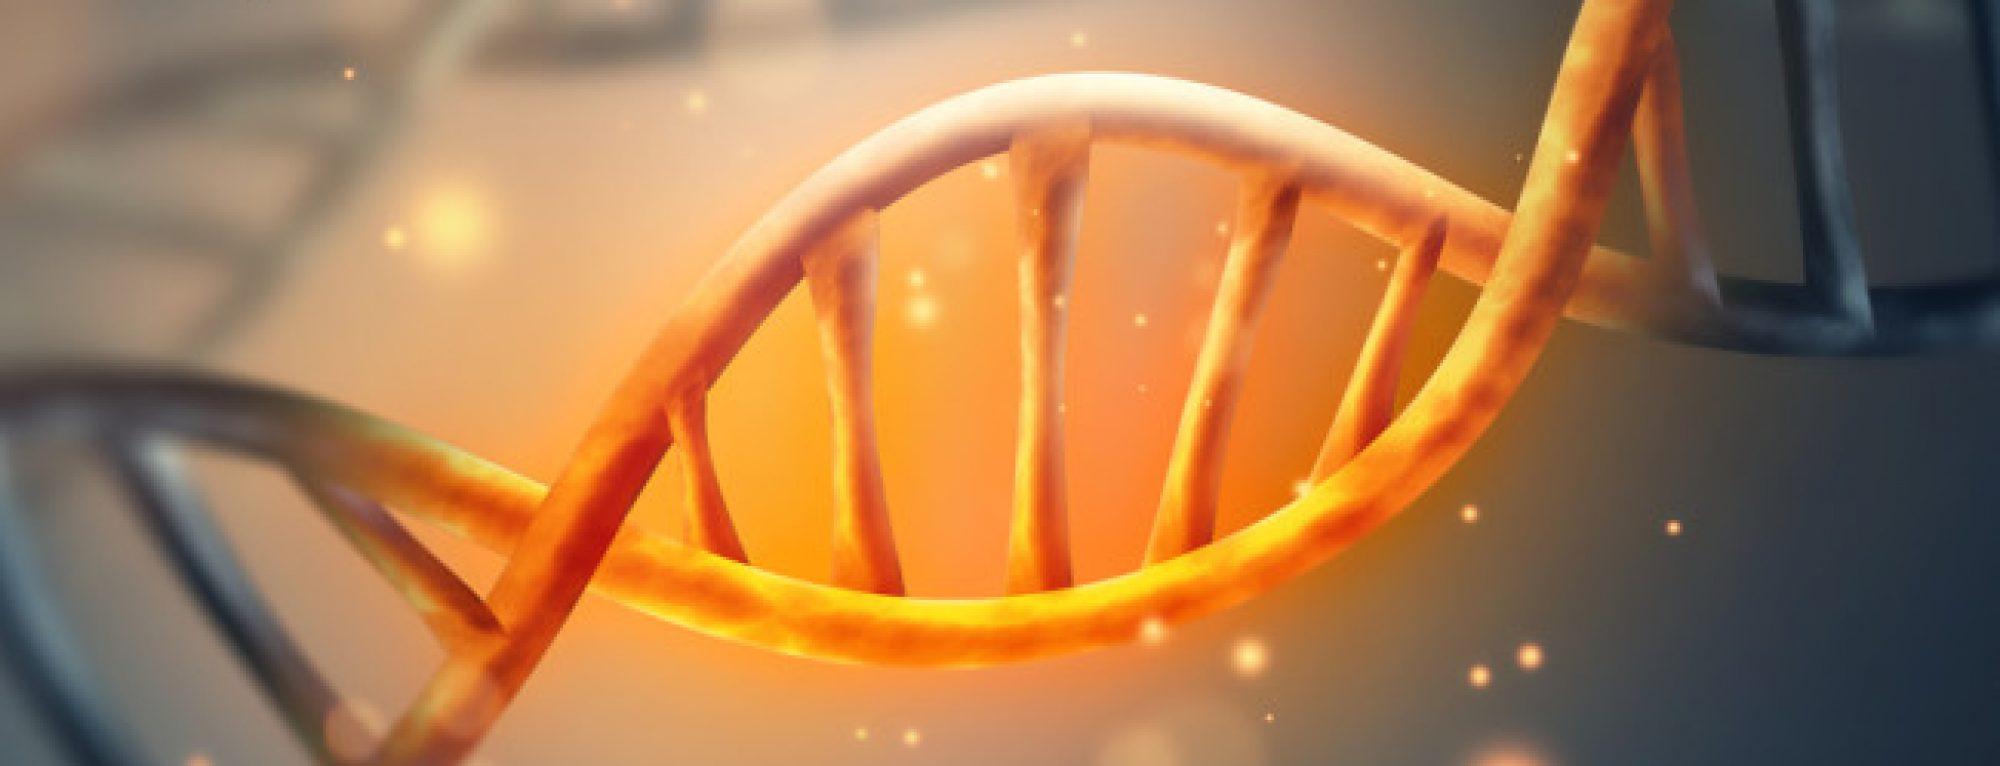 Analýza DNA